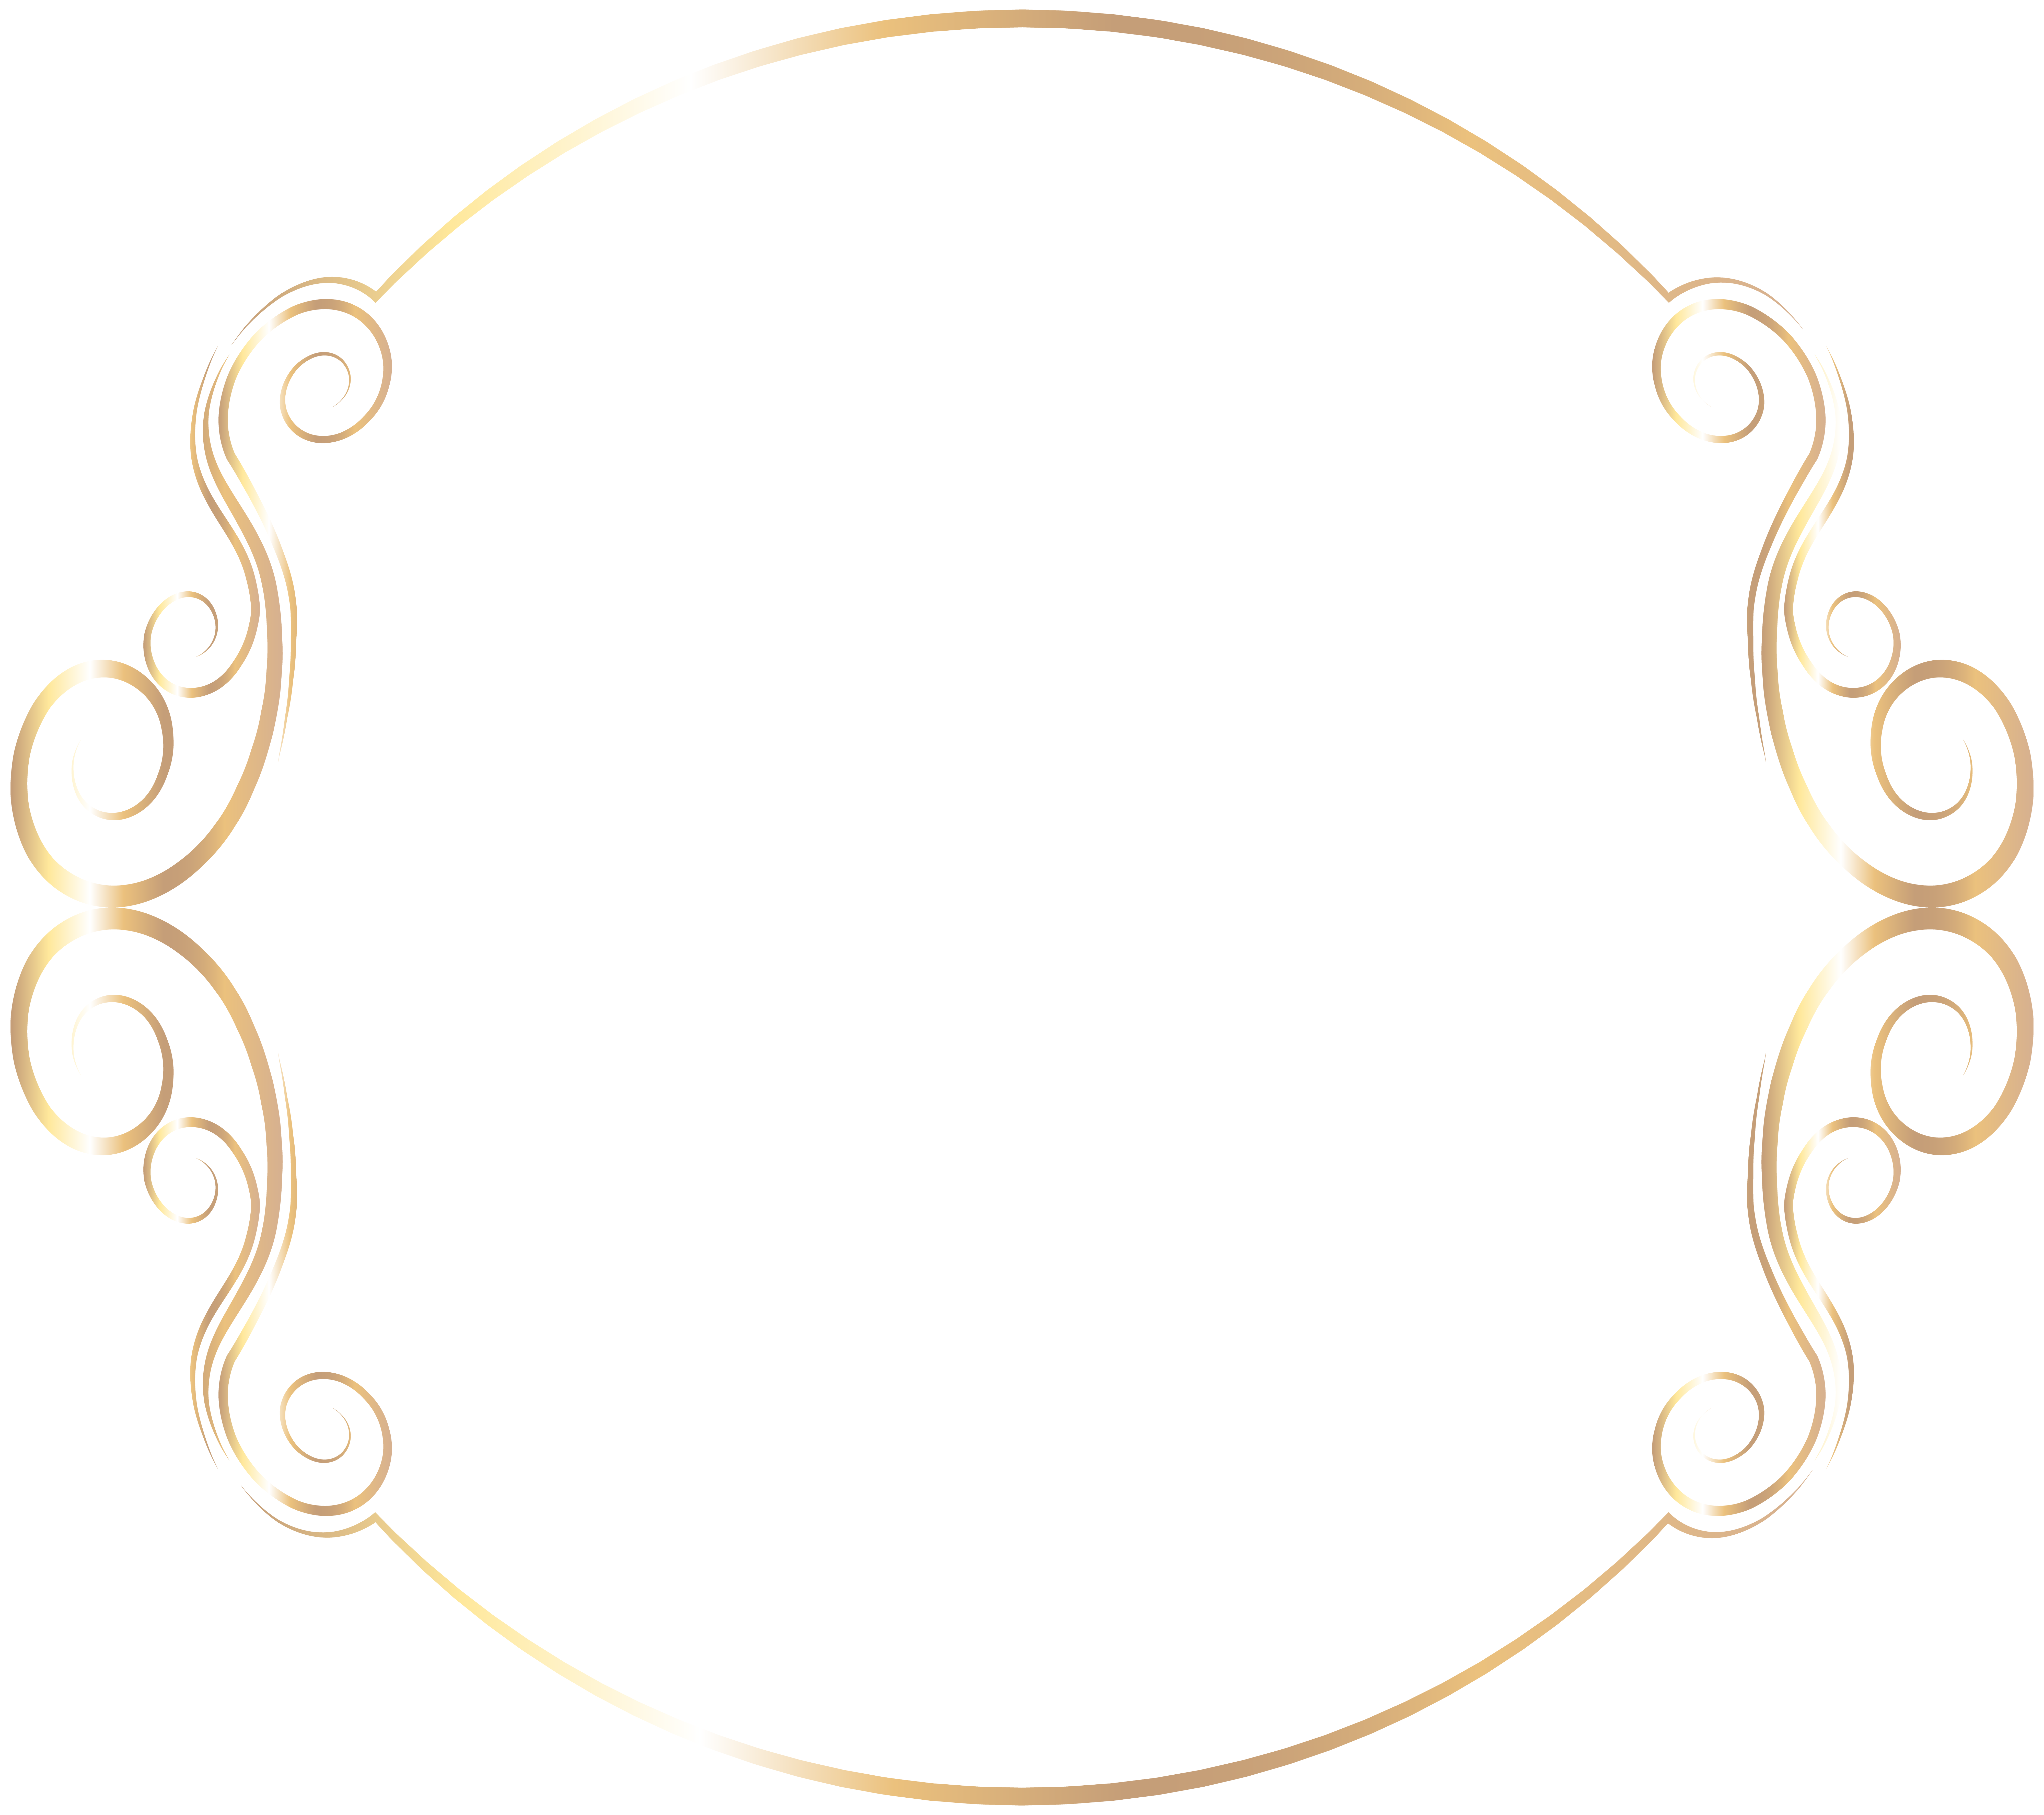 Grain clipart circle. Border frame png clip